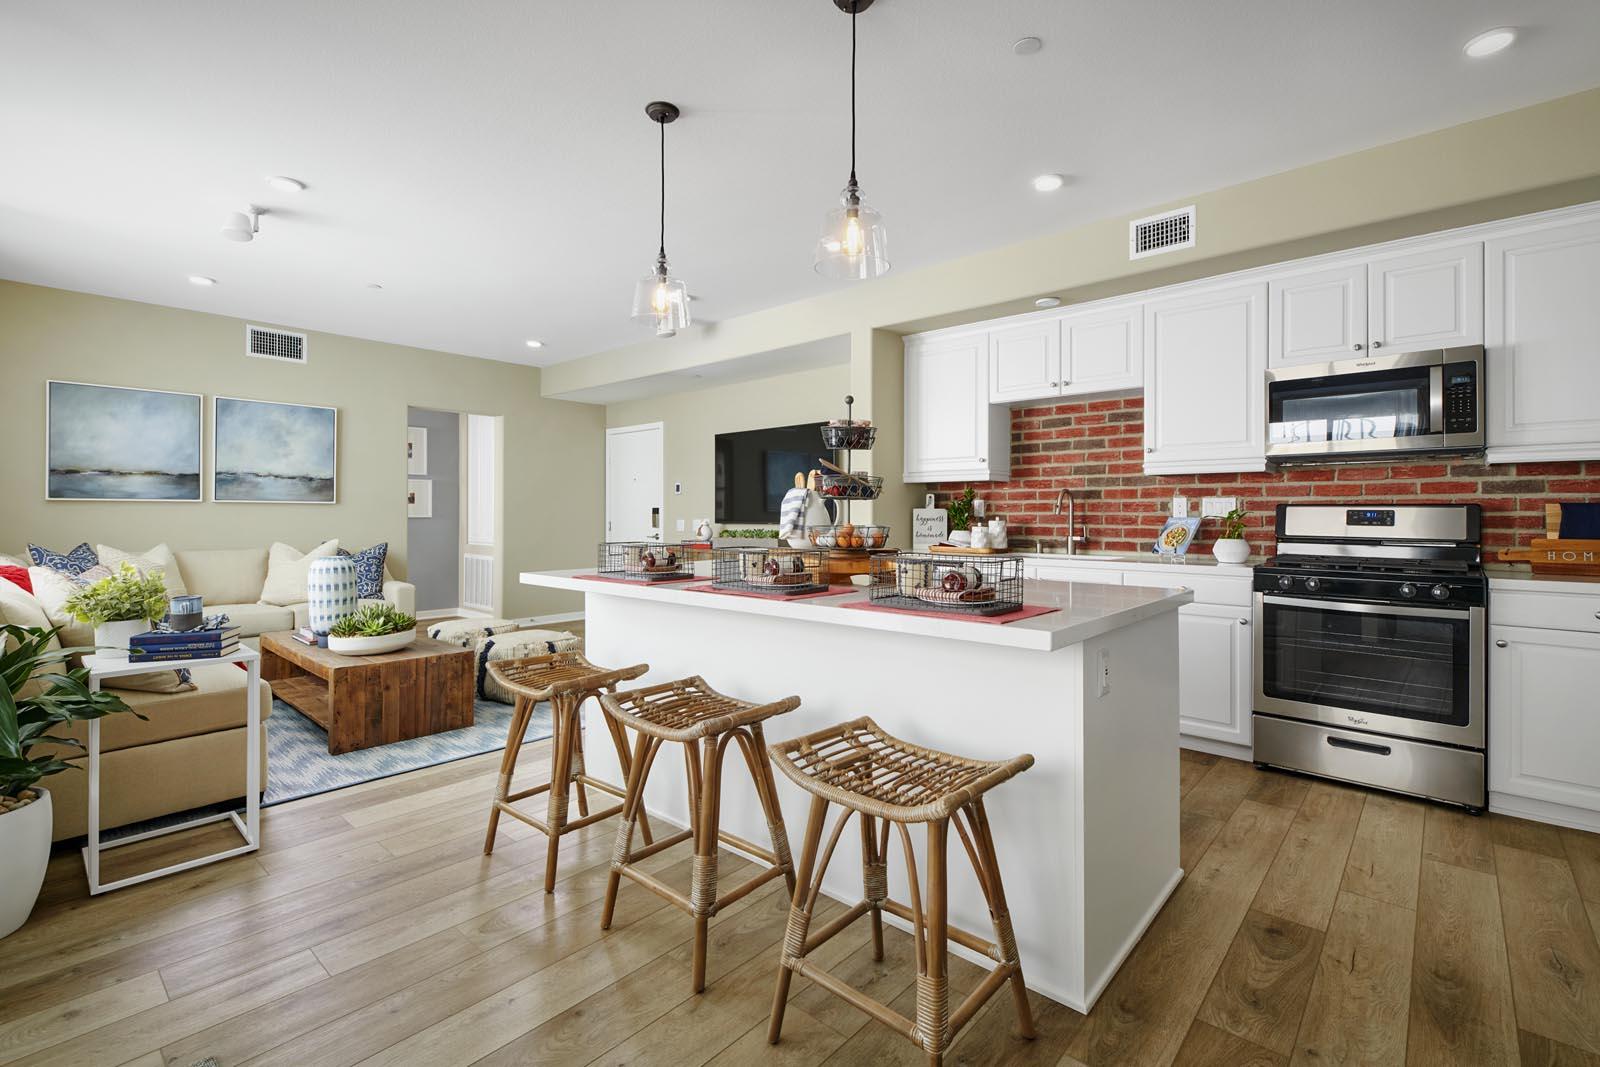 Kitchen | Residence 4 | Aspire | New Homes in Rancho Cucamonga, CA | Van Daele Homes